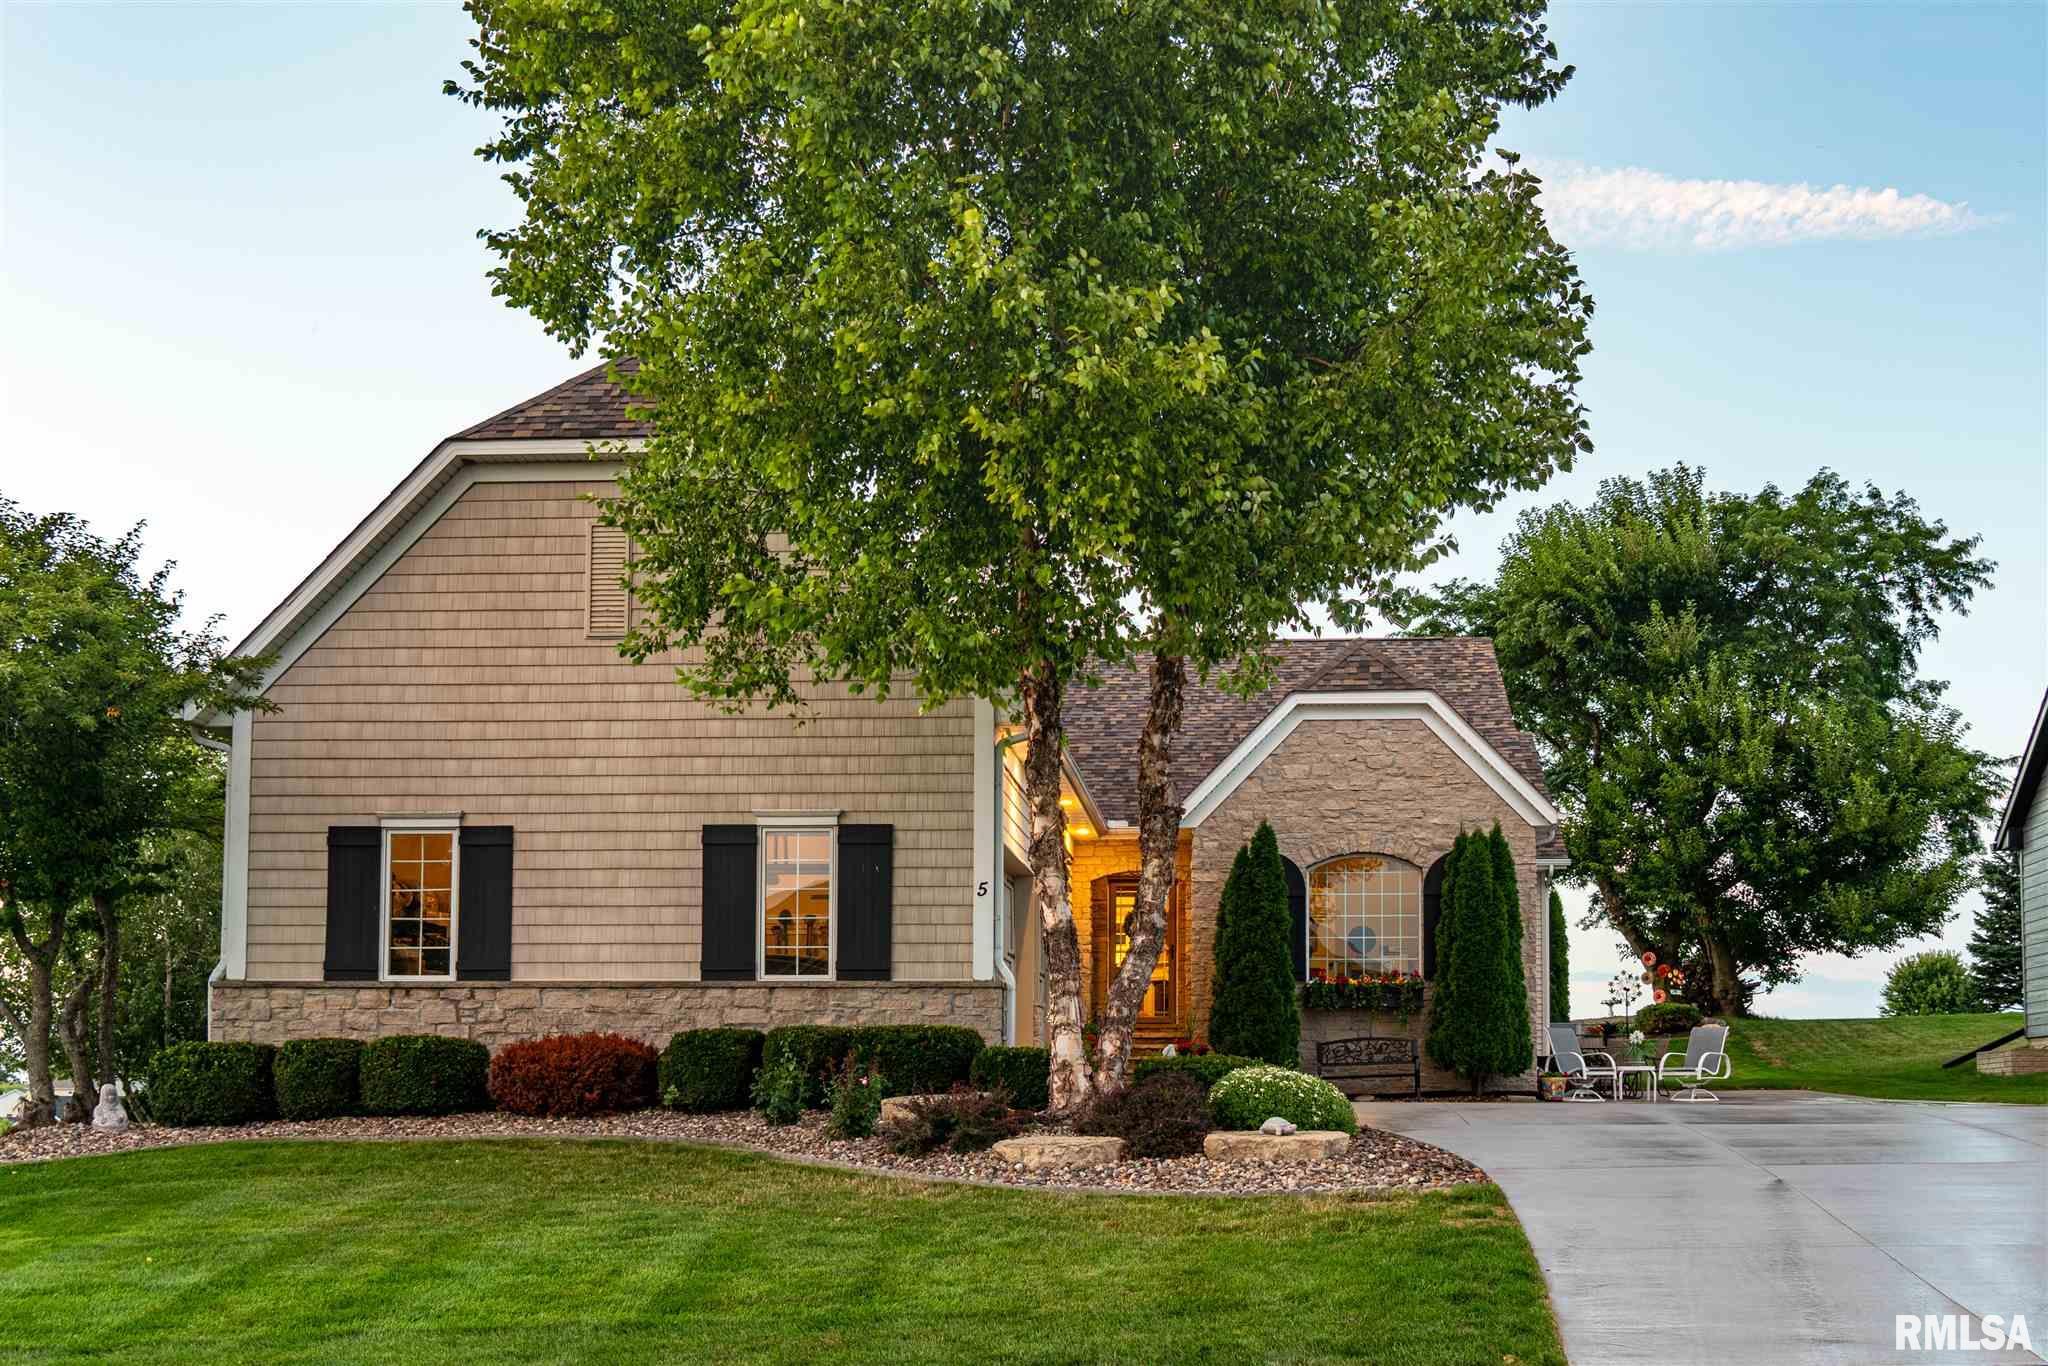 5 SANDSTONE Property Photo - Le Claire, IA real estate listing